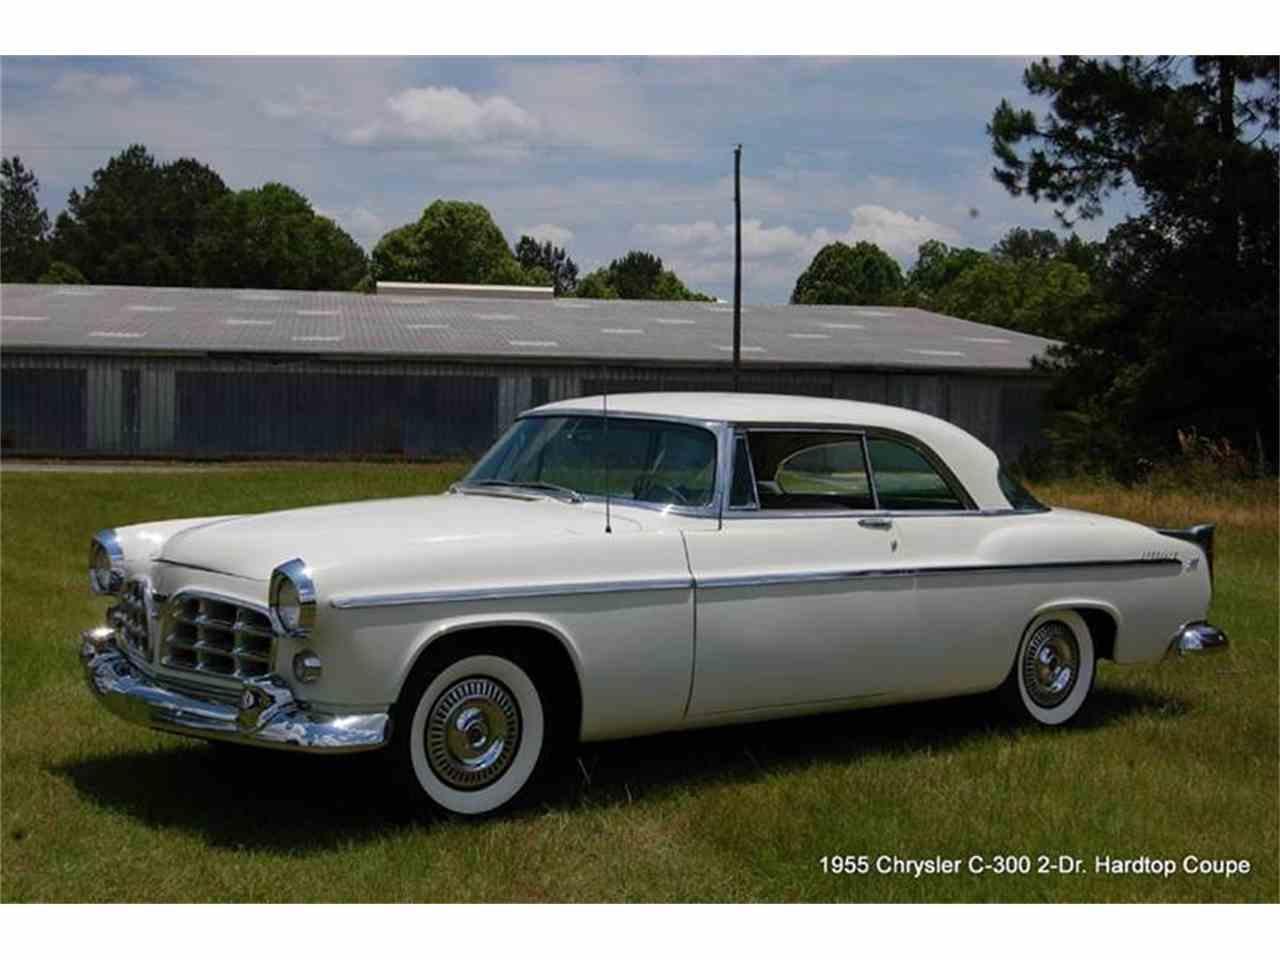 Chrysler 300 Letter Series I (C-300) 1955 - 1955 Coupe-Hardtop #4